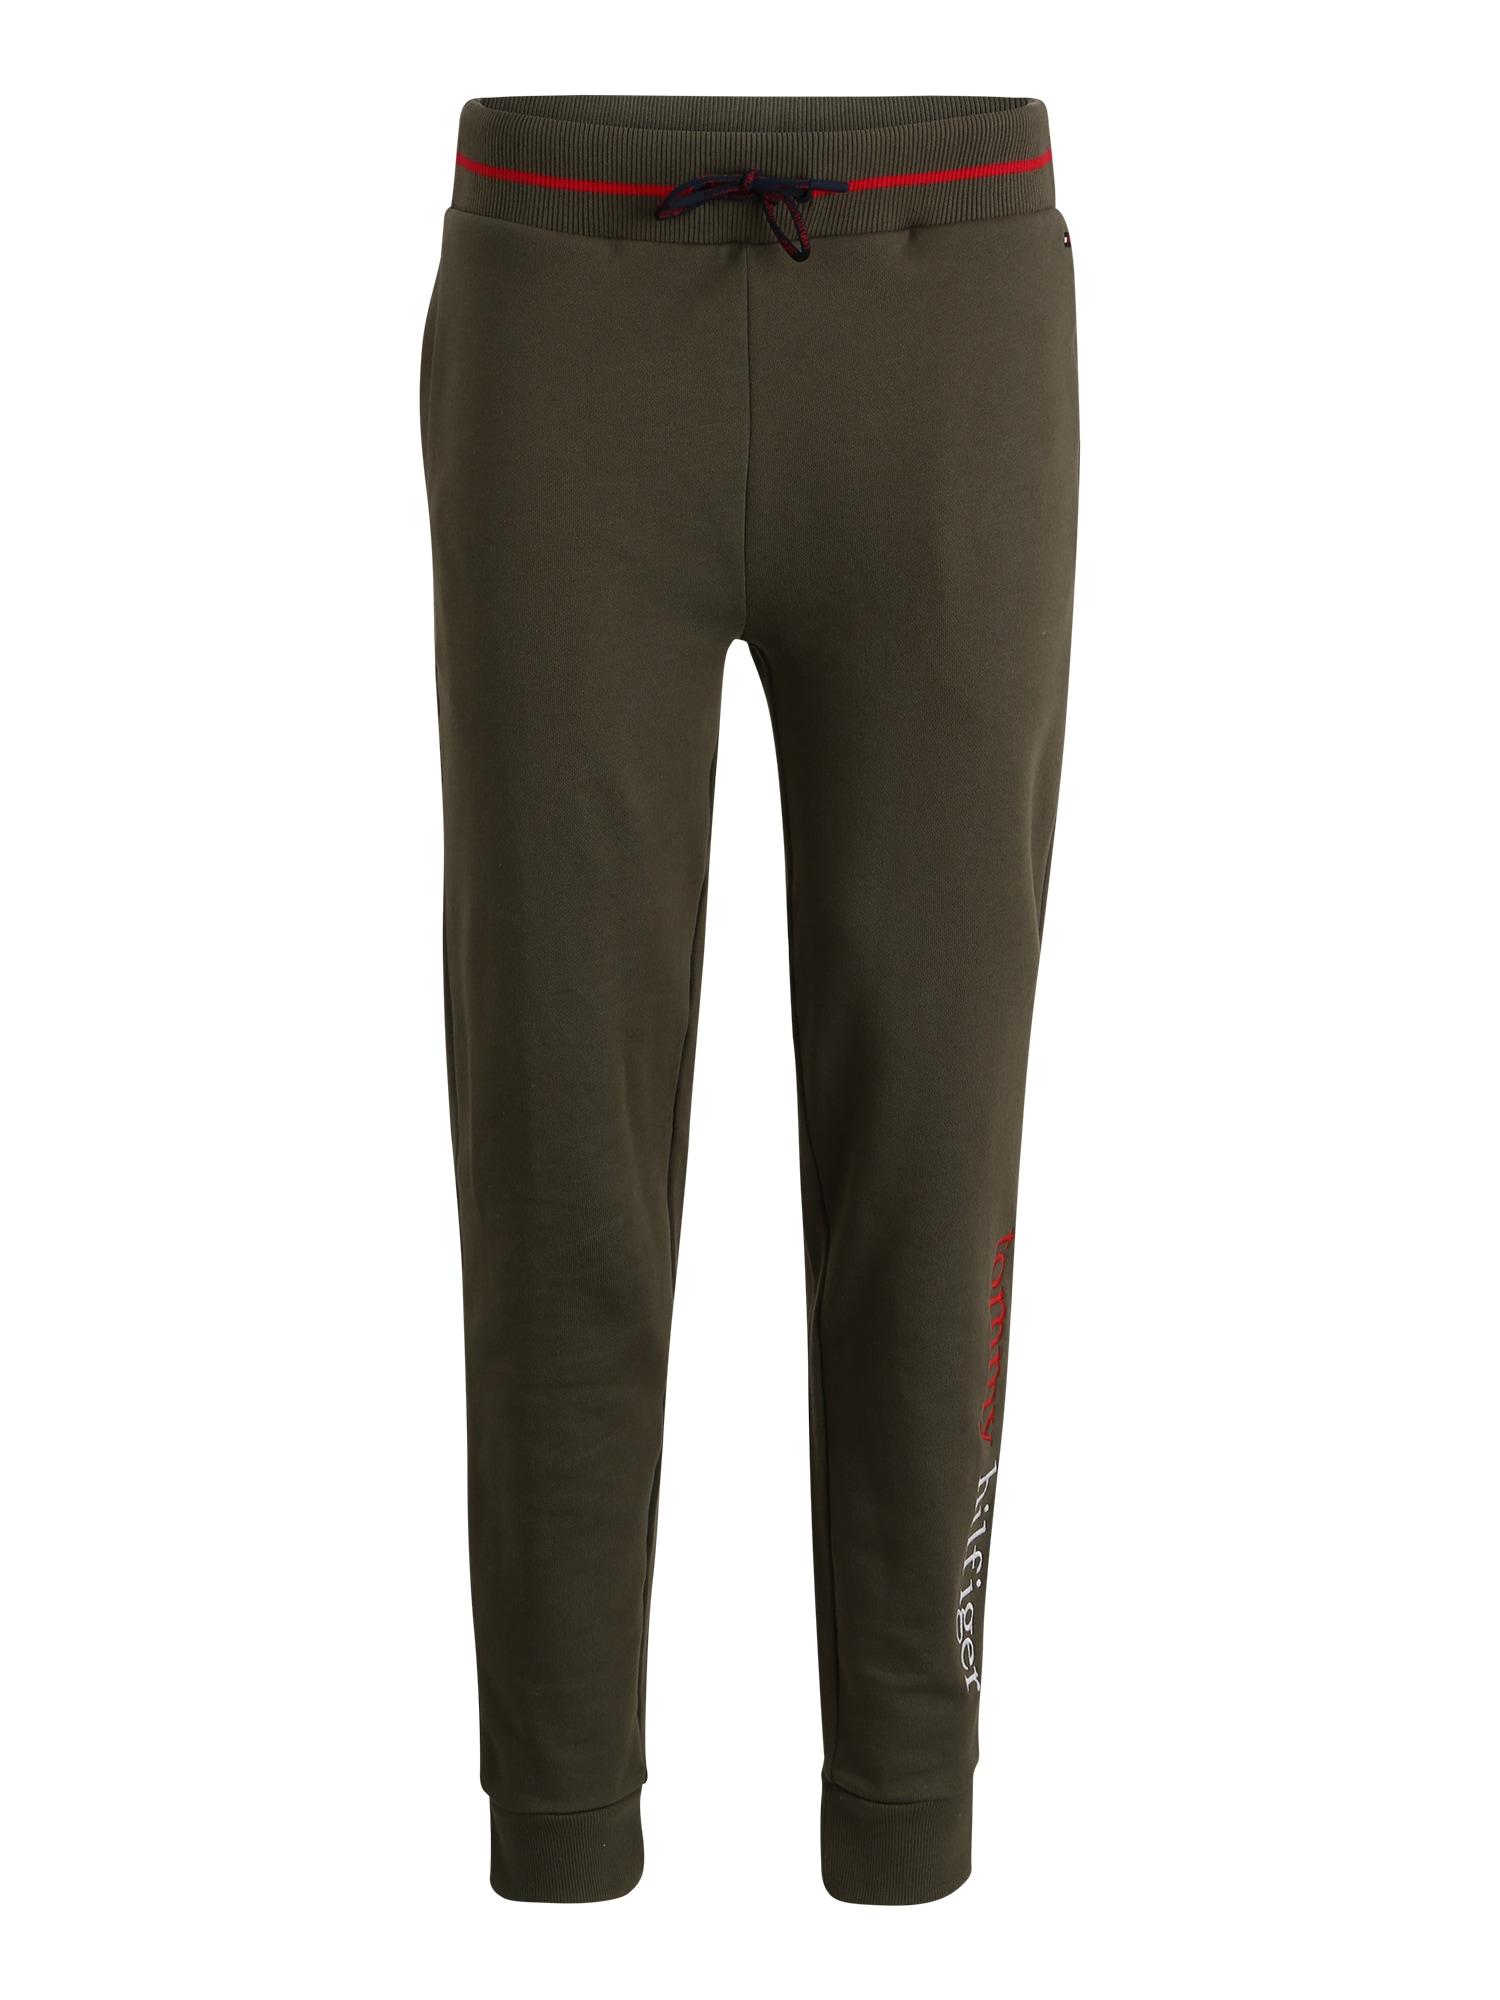 Tommy Hilfiger Underwear Kelnės 'PANTS LWK' tamsiai žalia